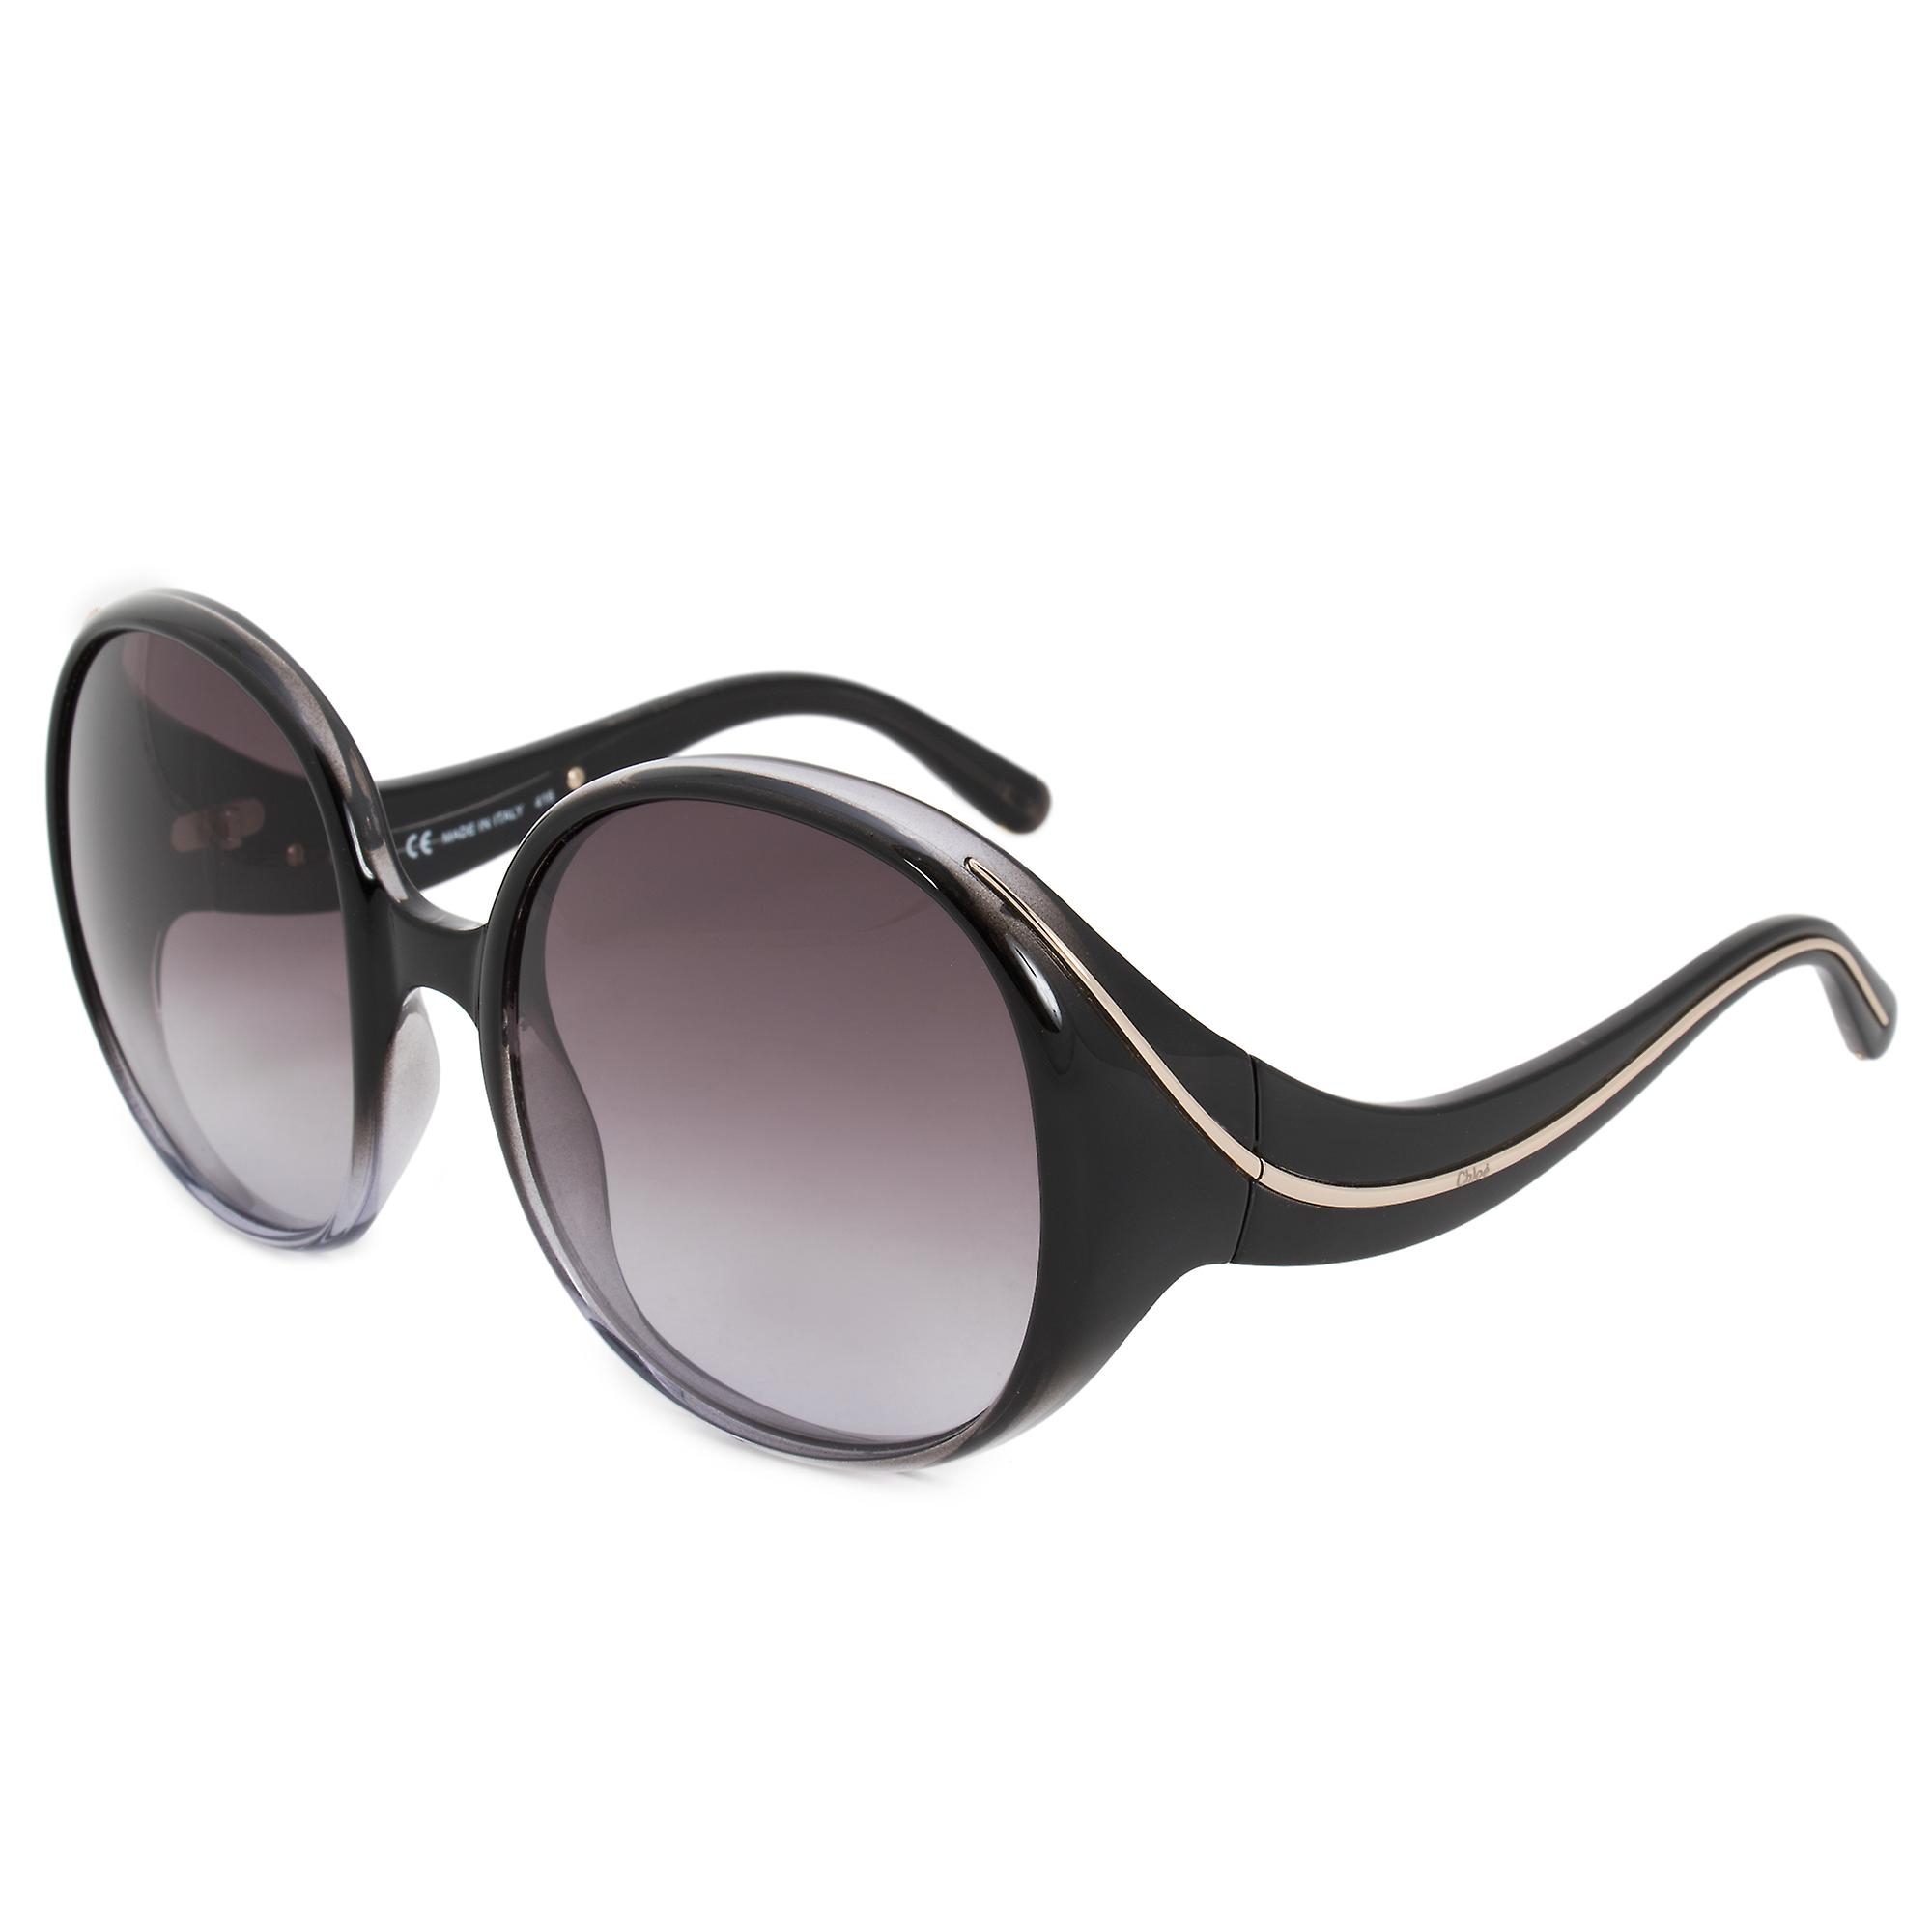 Chloe Oval Sunglasses CE727S 002 59